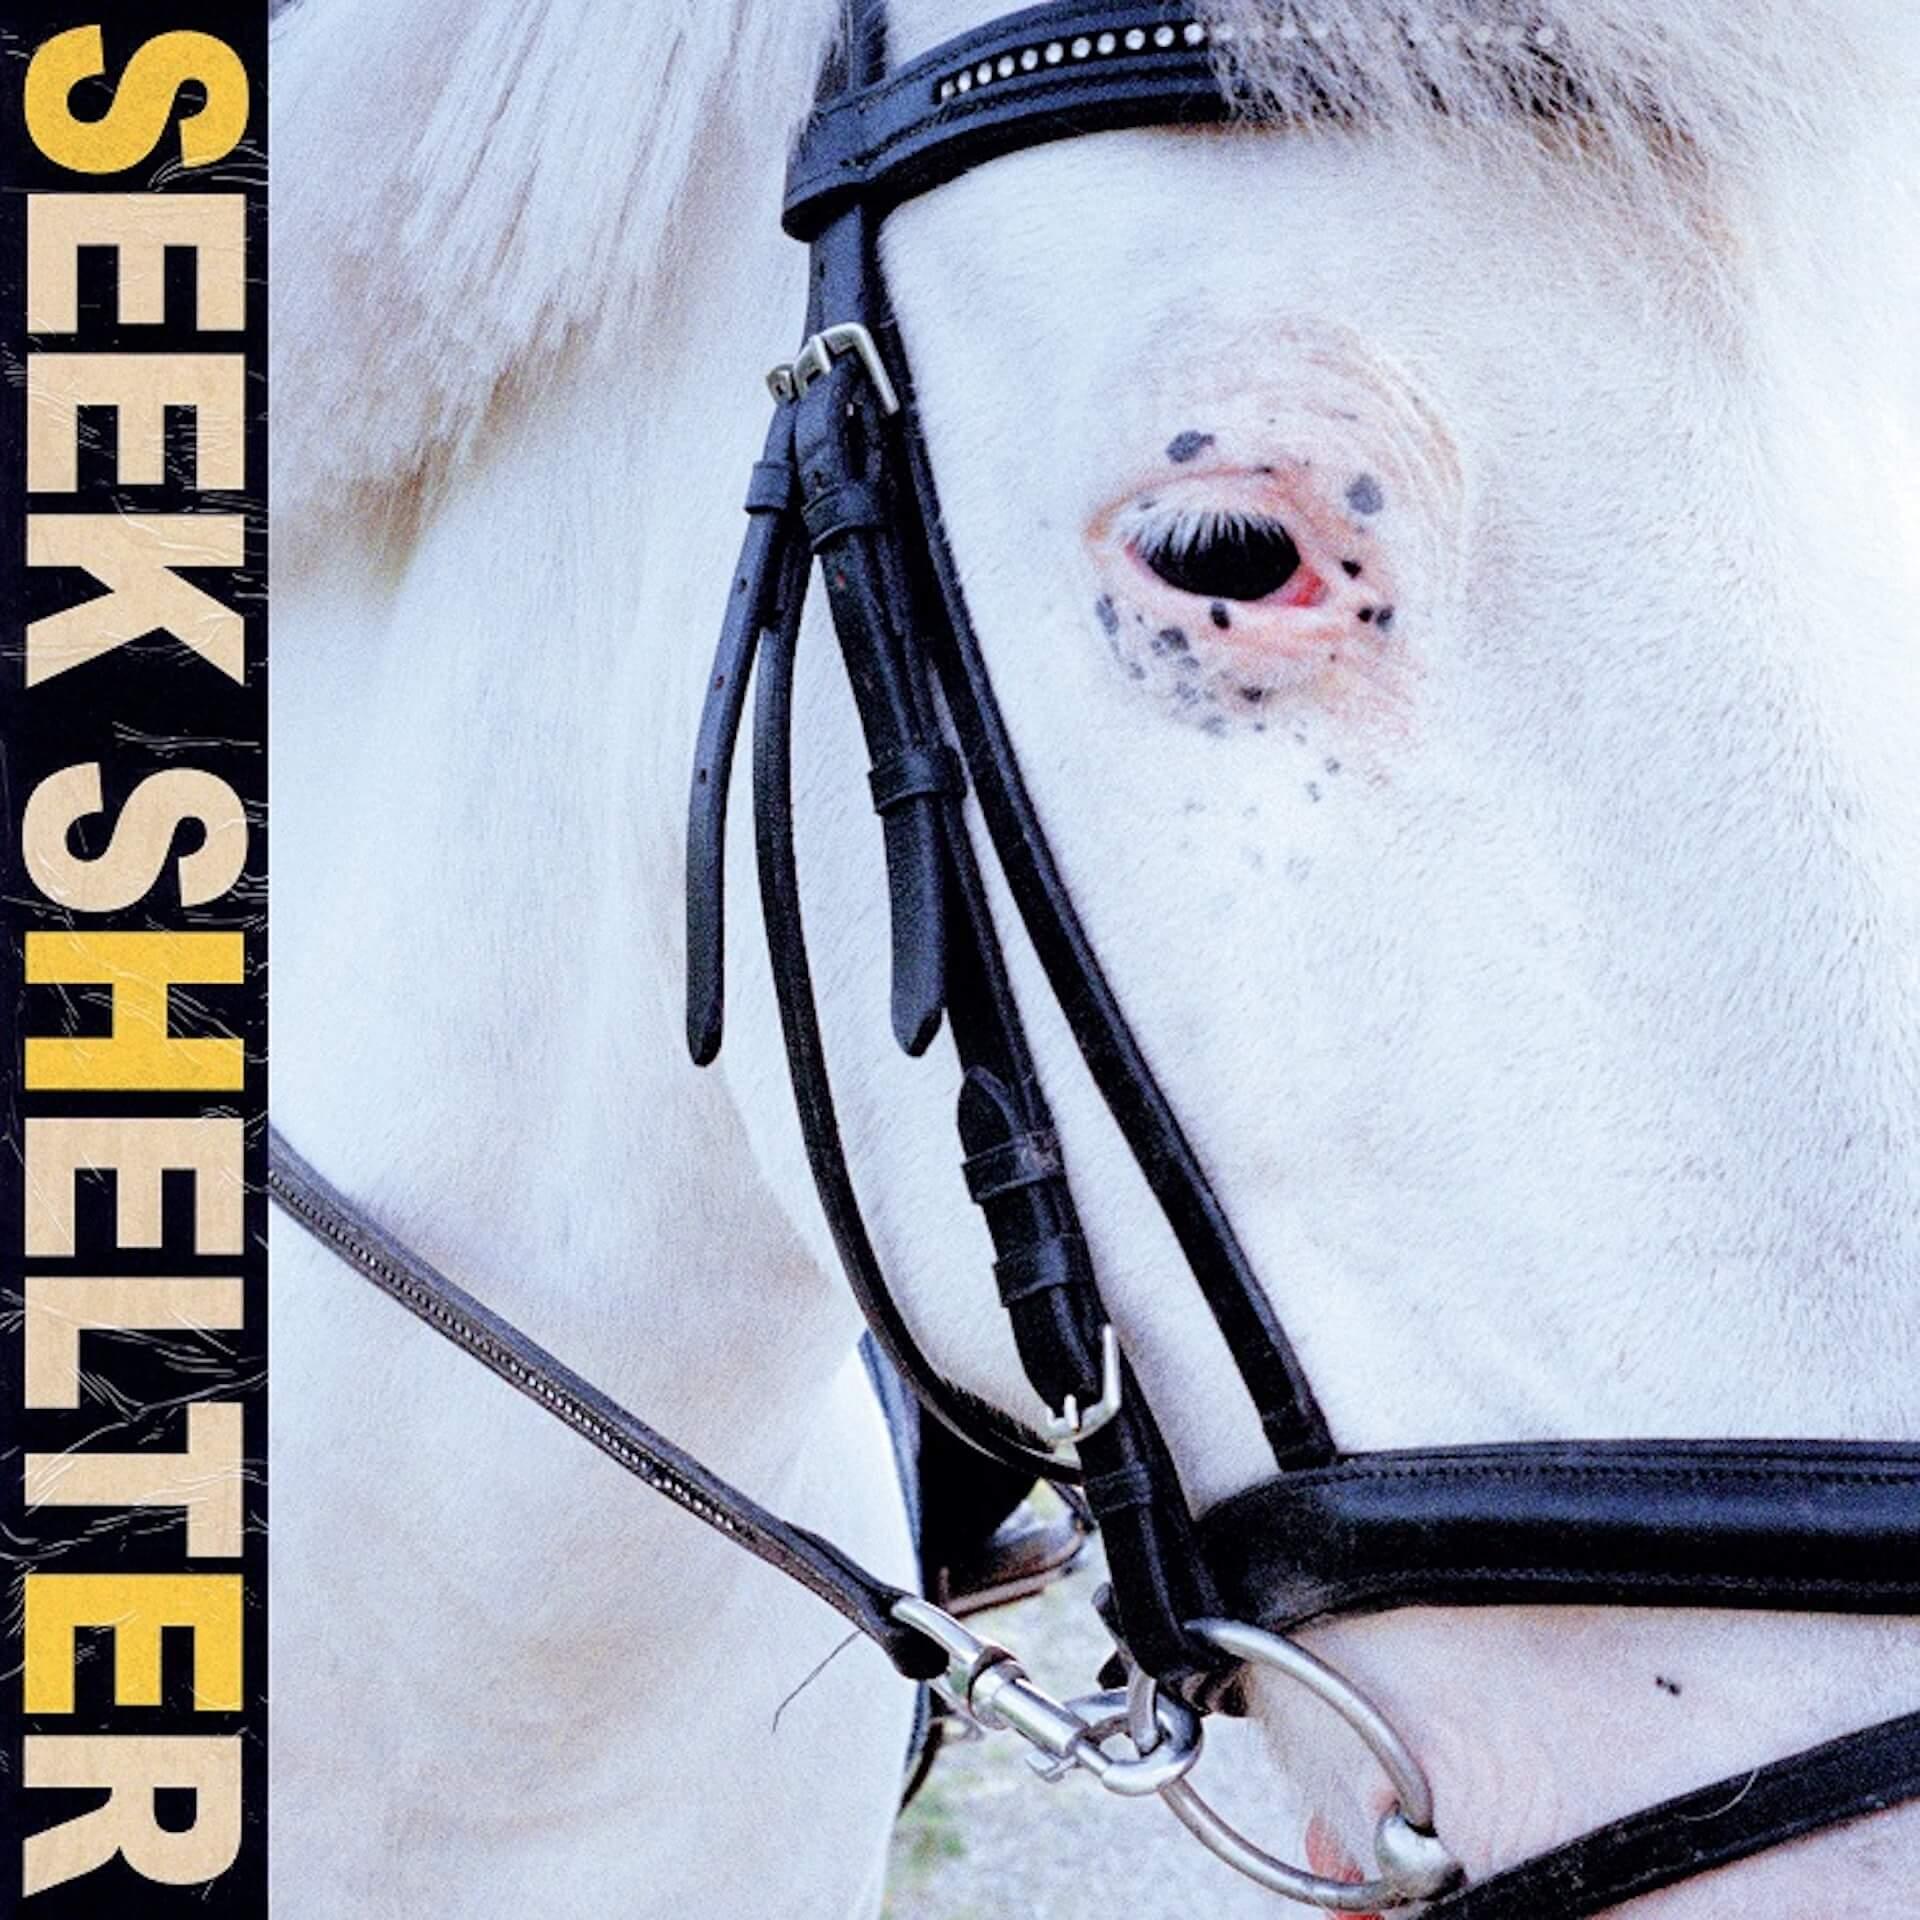 Iceageの5thアルバム『Seek Shelter』が発売!ストリーミングライブ<Seek Shelter: Live From Copenhagen>を開催 music210507_iceage-210507_1